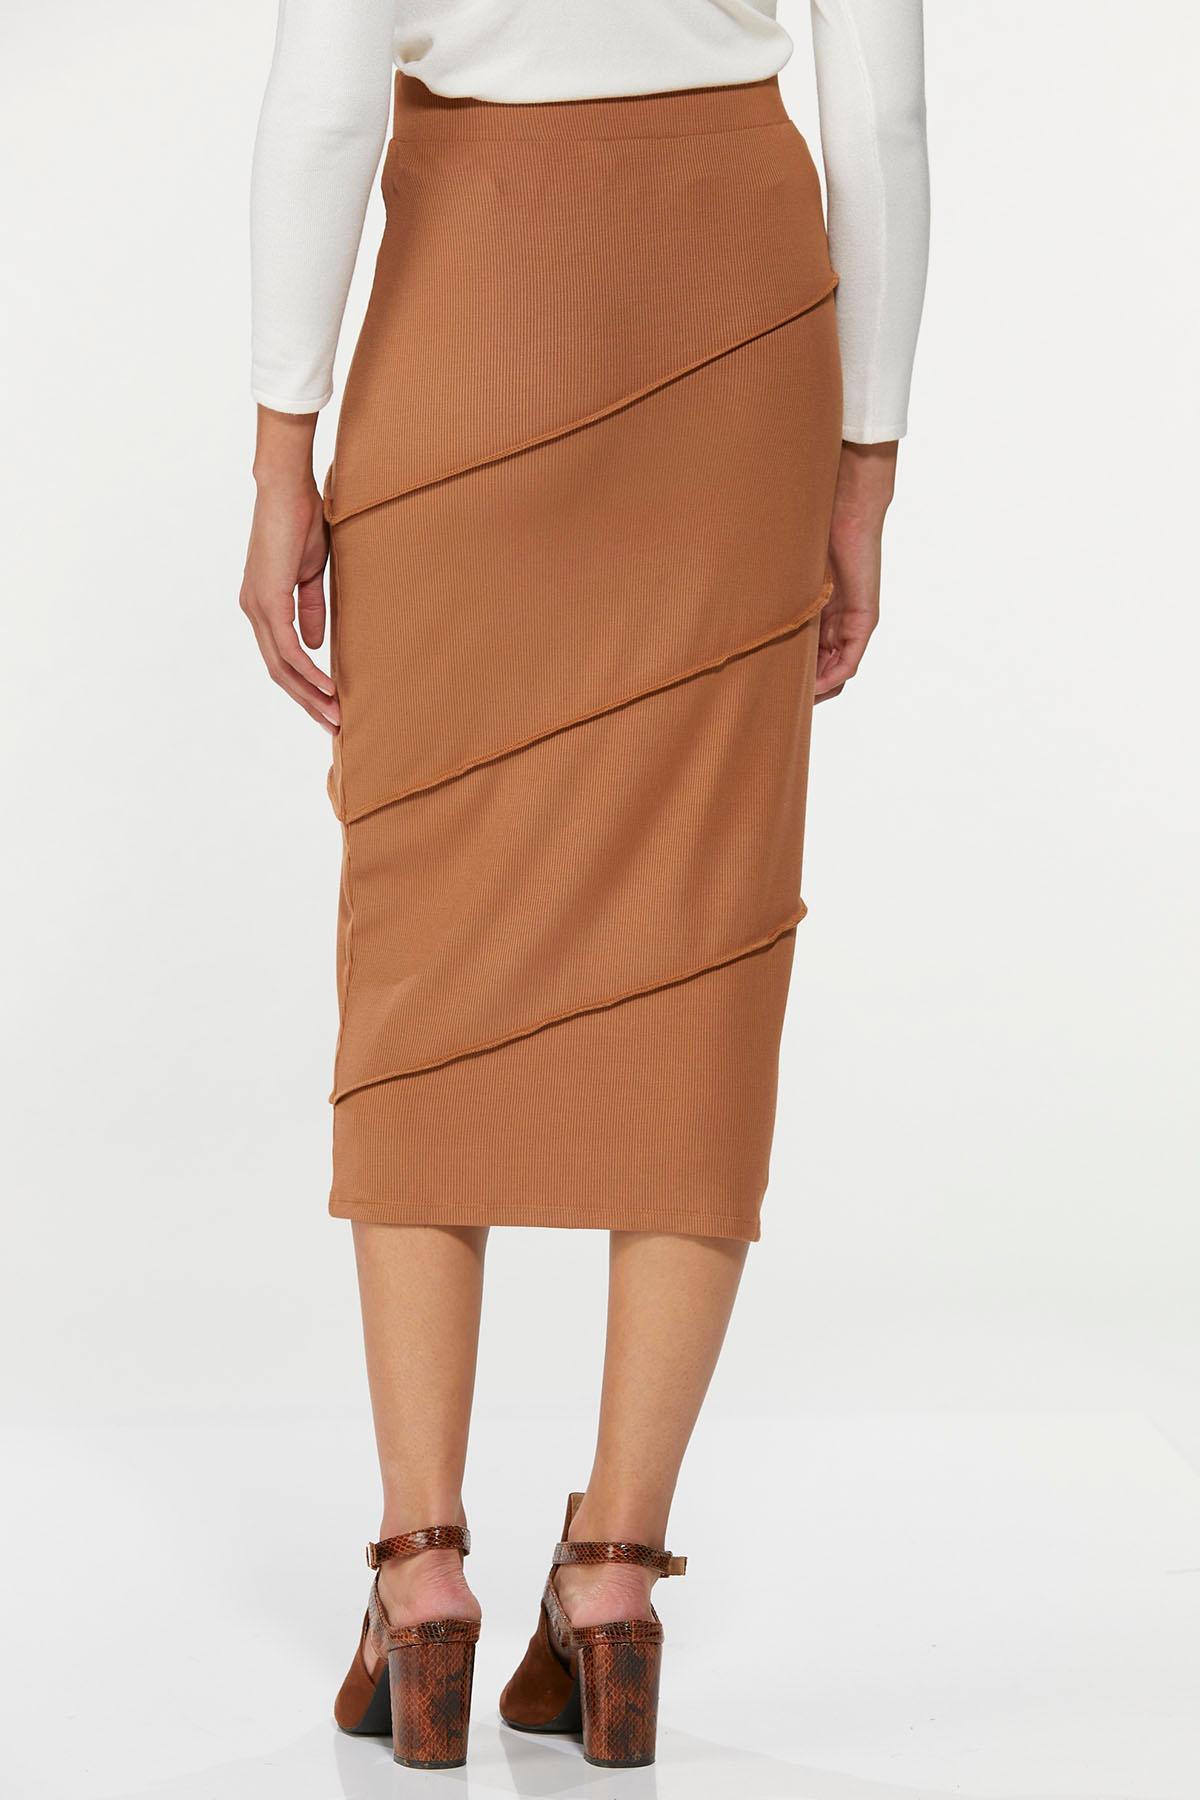 Ribbed Pencil Skirt (Item #44671491)